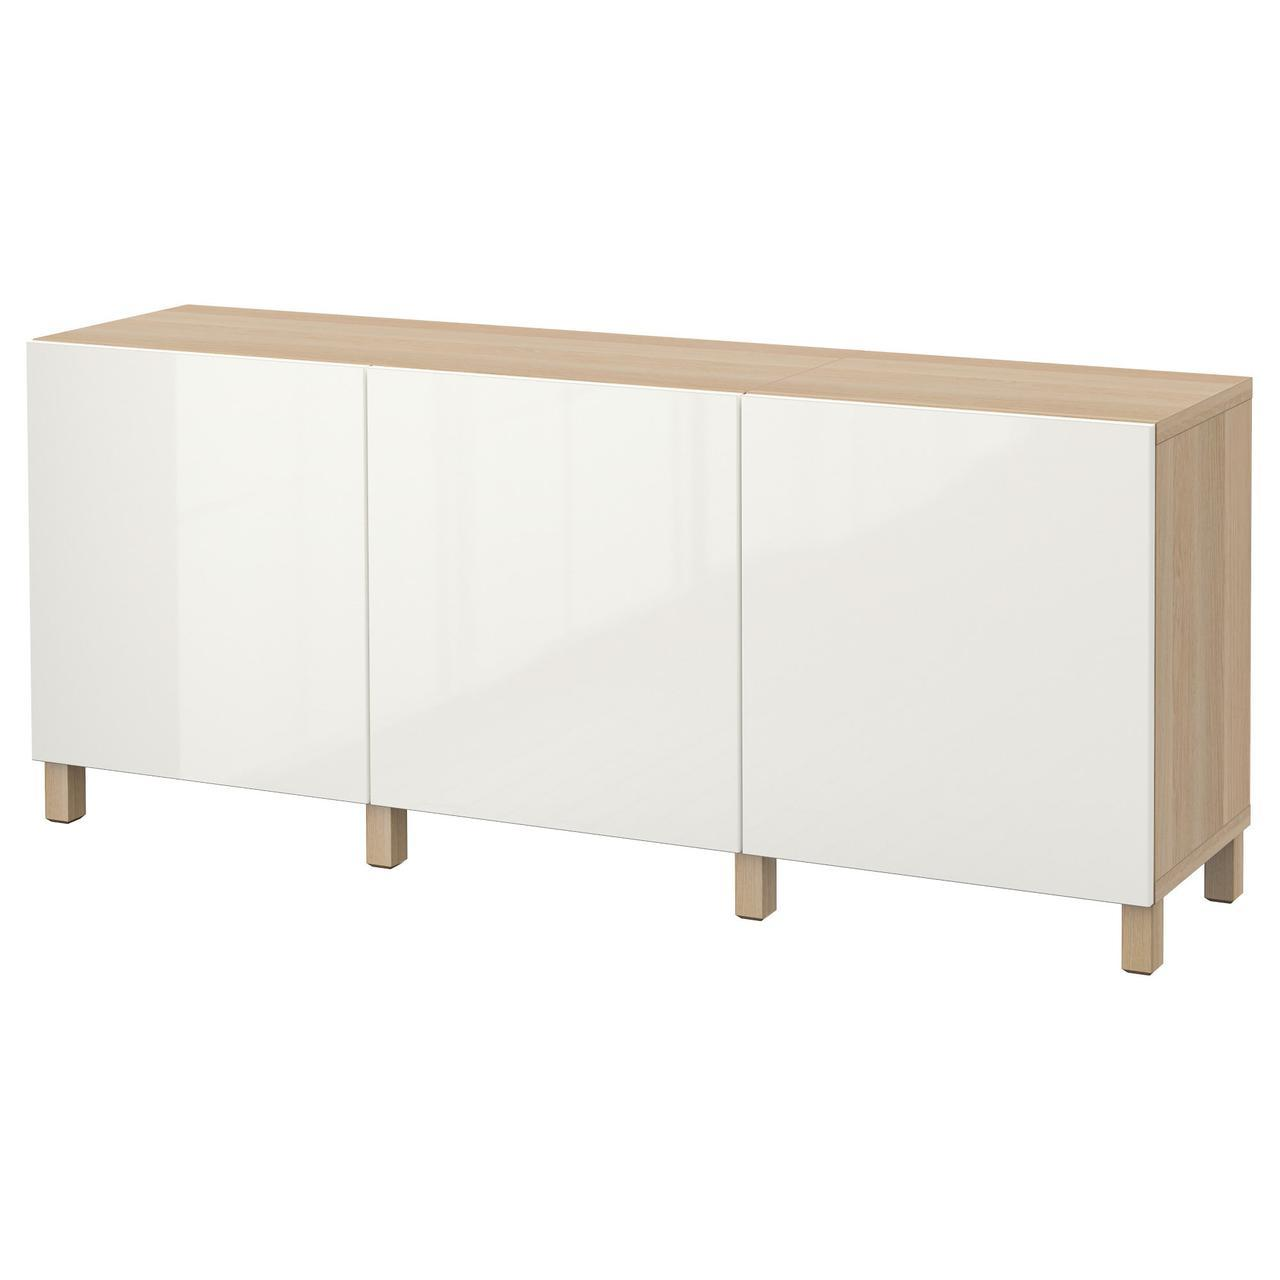 IKEA BESTA (791.398.34) Сервант/буфет